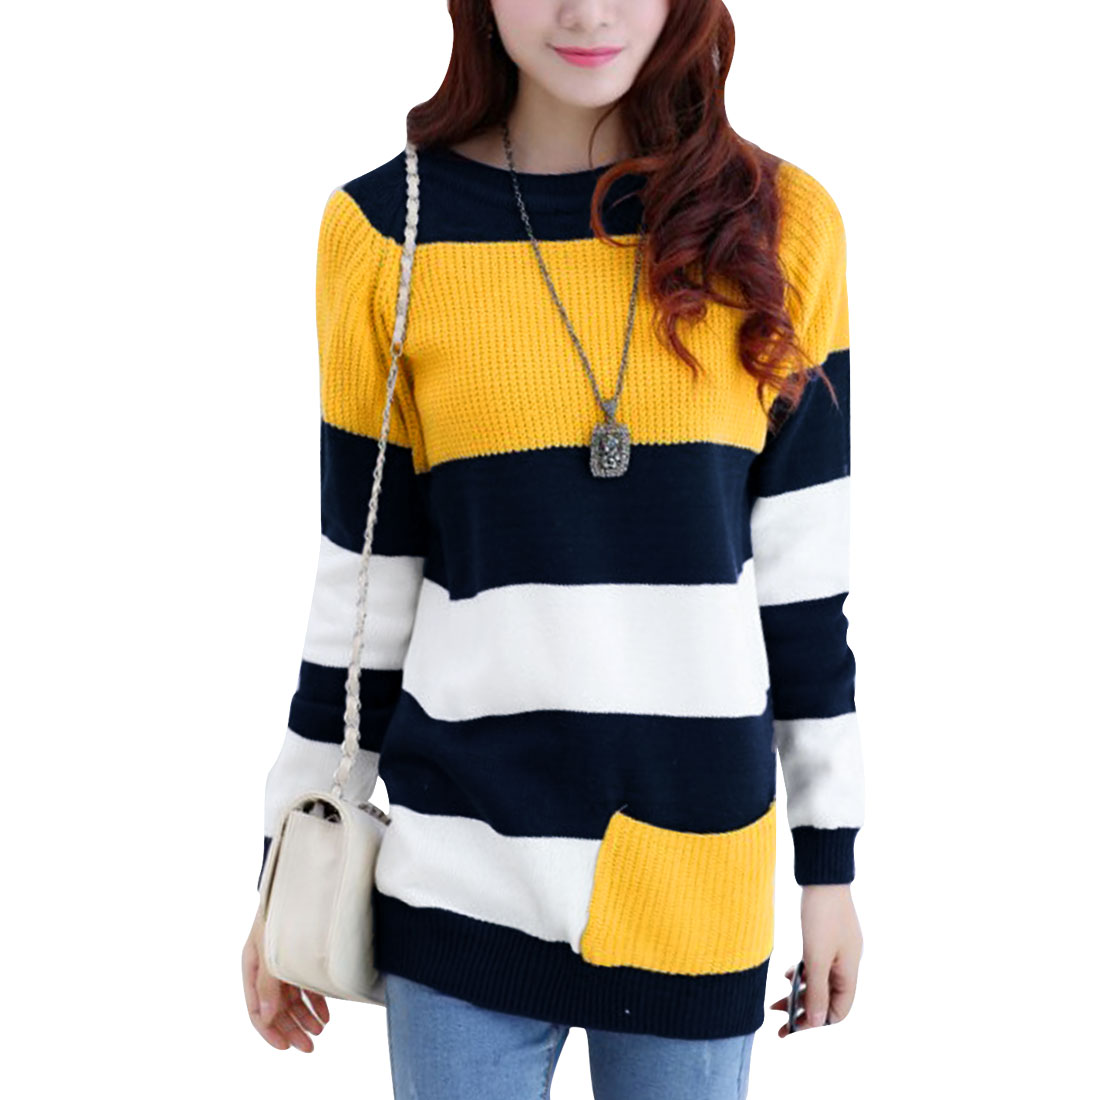 Women One Pocket Ribbed Cuffs Yellow Navy Blue Stripes Tunic Sweater XS